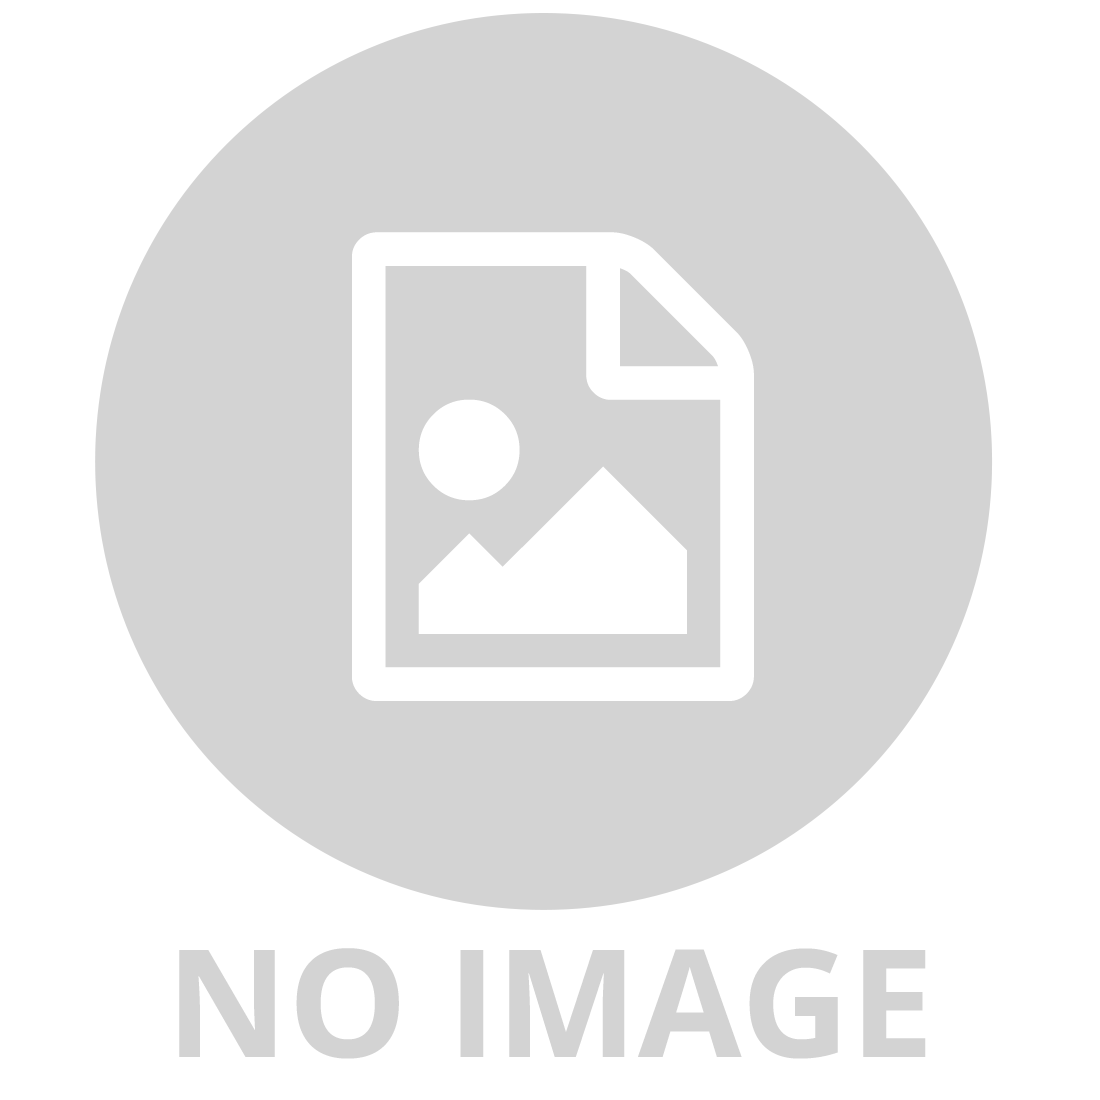 DISNEY PIXAR CARS - LUIGI & GUIDO